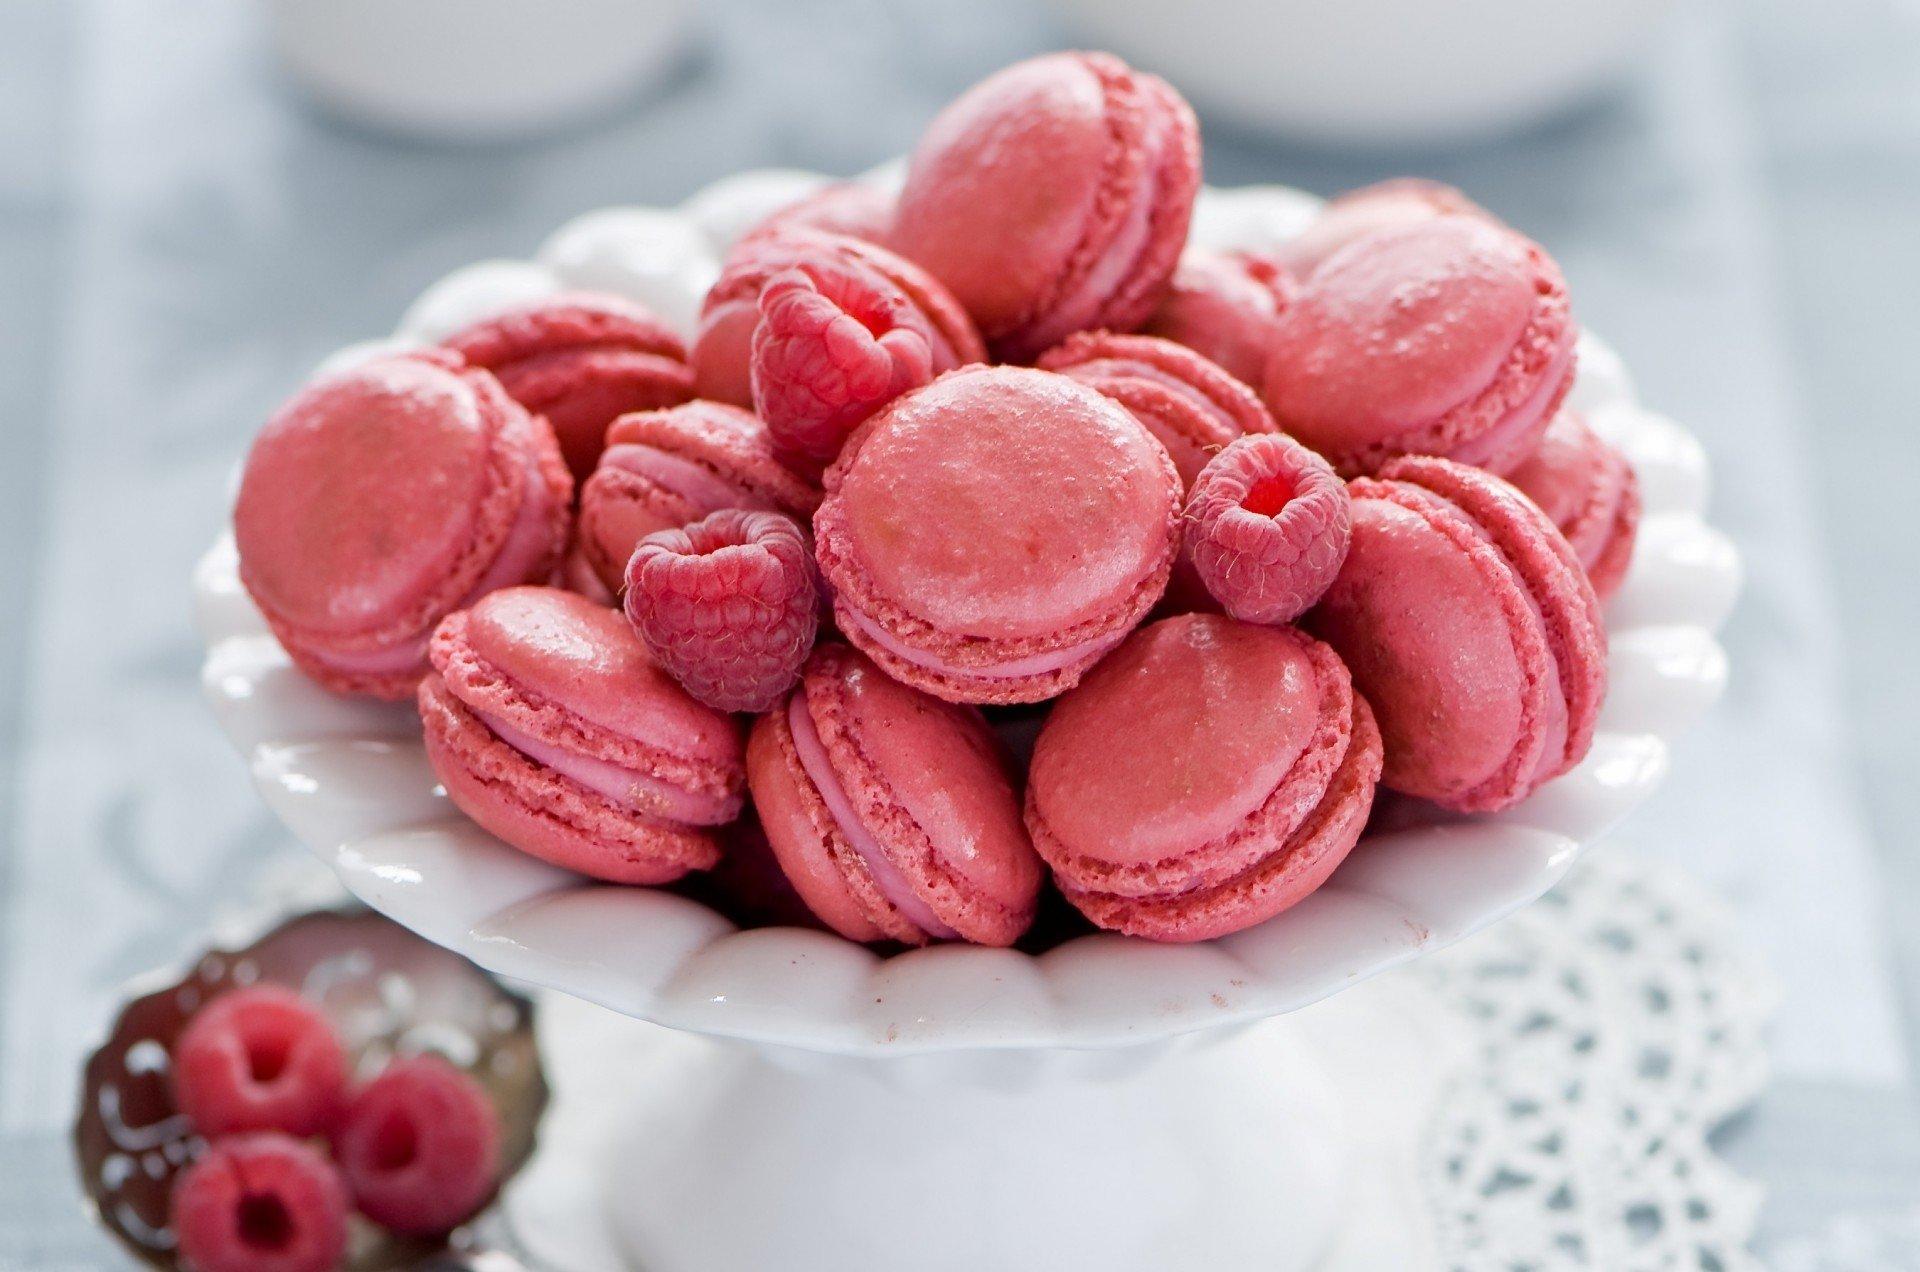 sobremesa-rosa-cha-de-panela-macaron-02-min